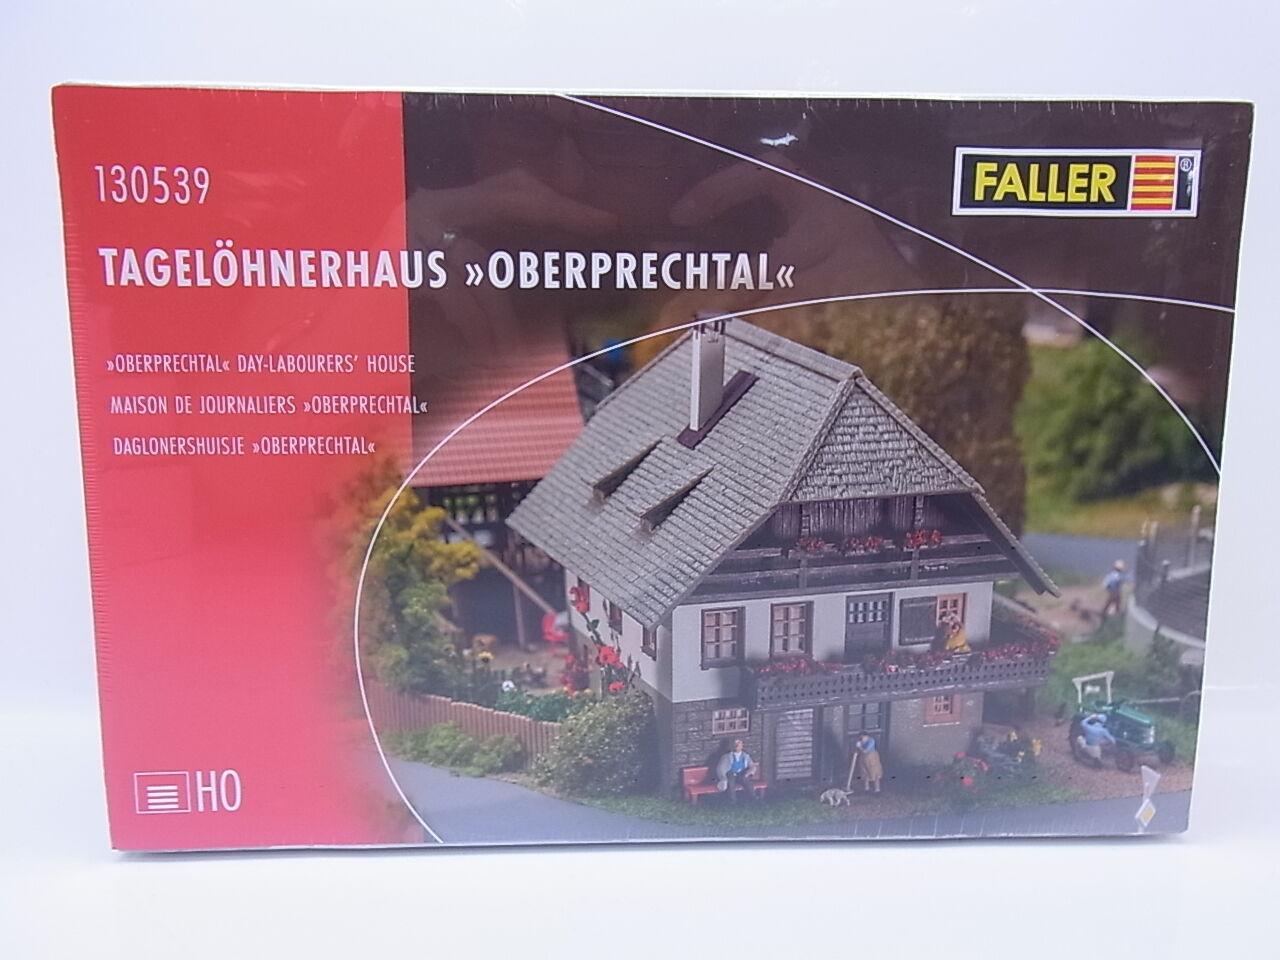 LOT 45140   Faller H0 130539 Tagelöhnerhaus Oberprechtal Haus Bausatz NEU OVP  | Exquisite Handwerkskunst